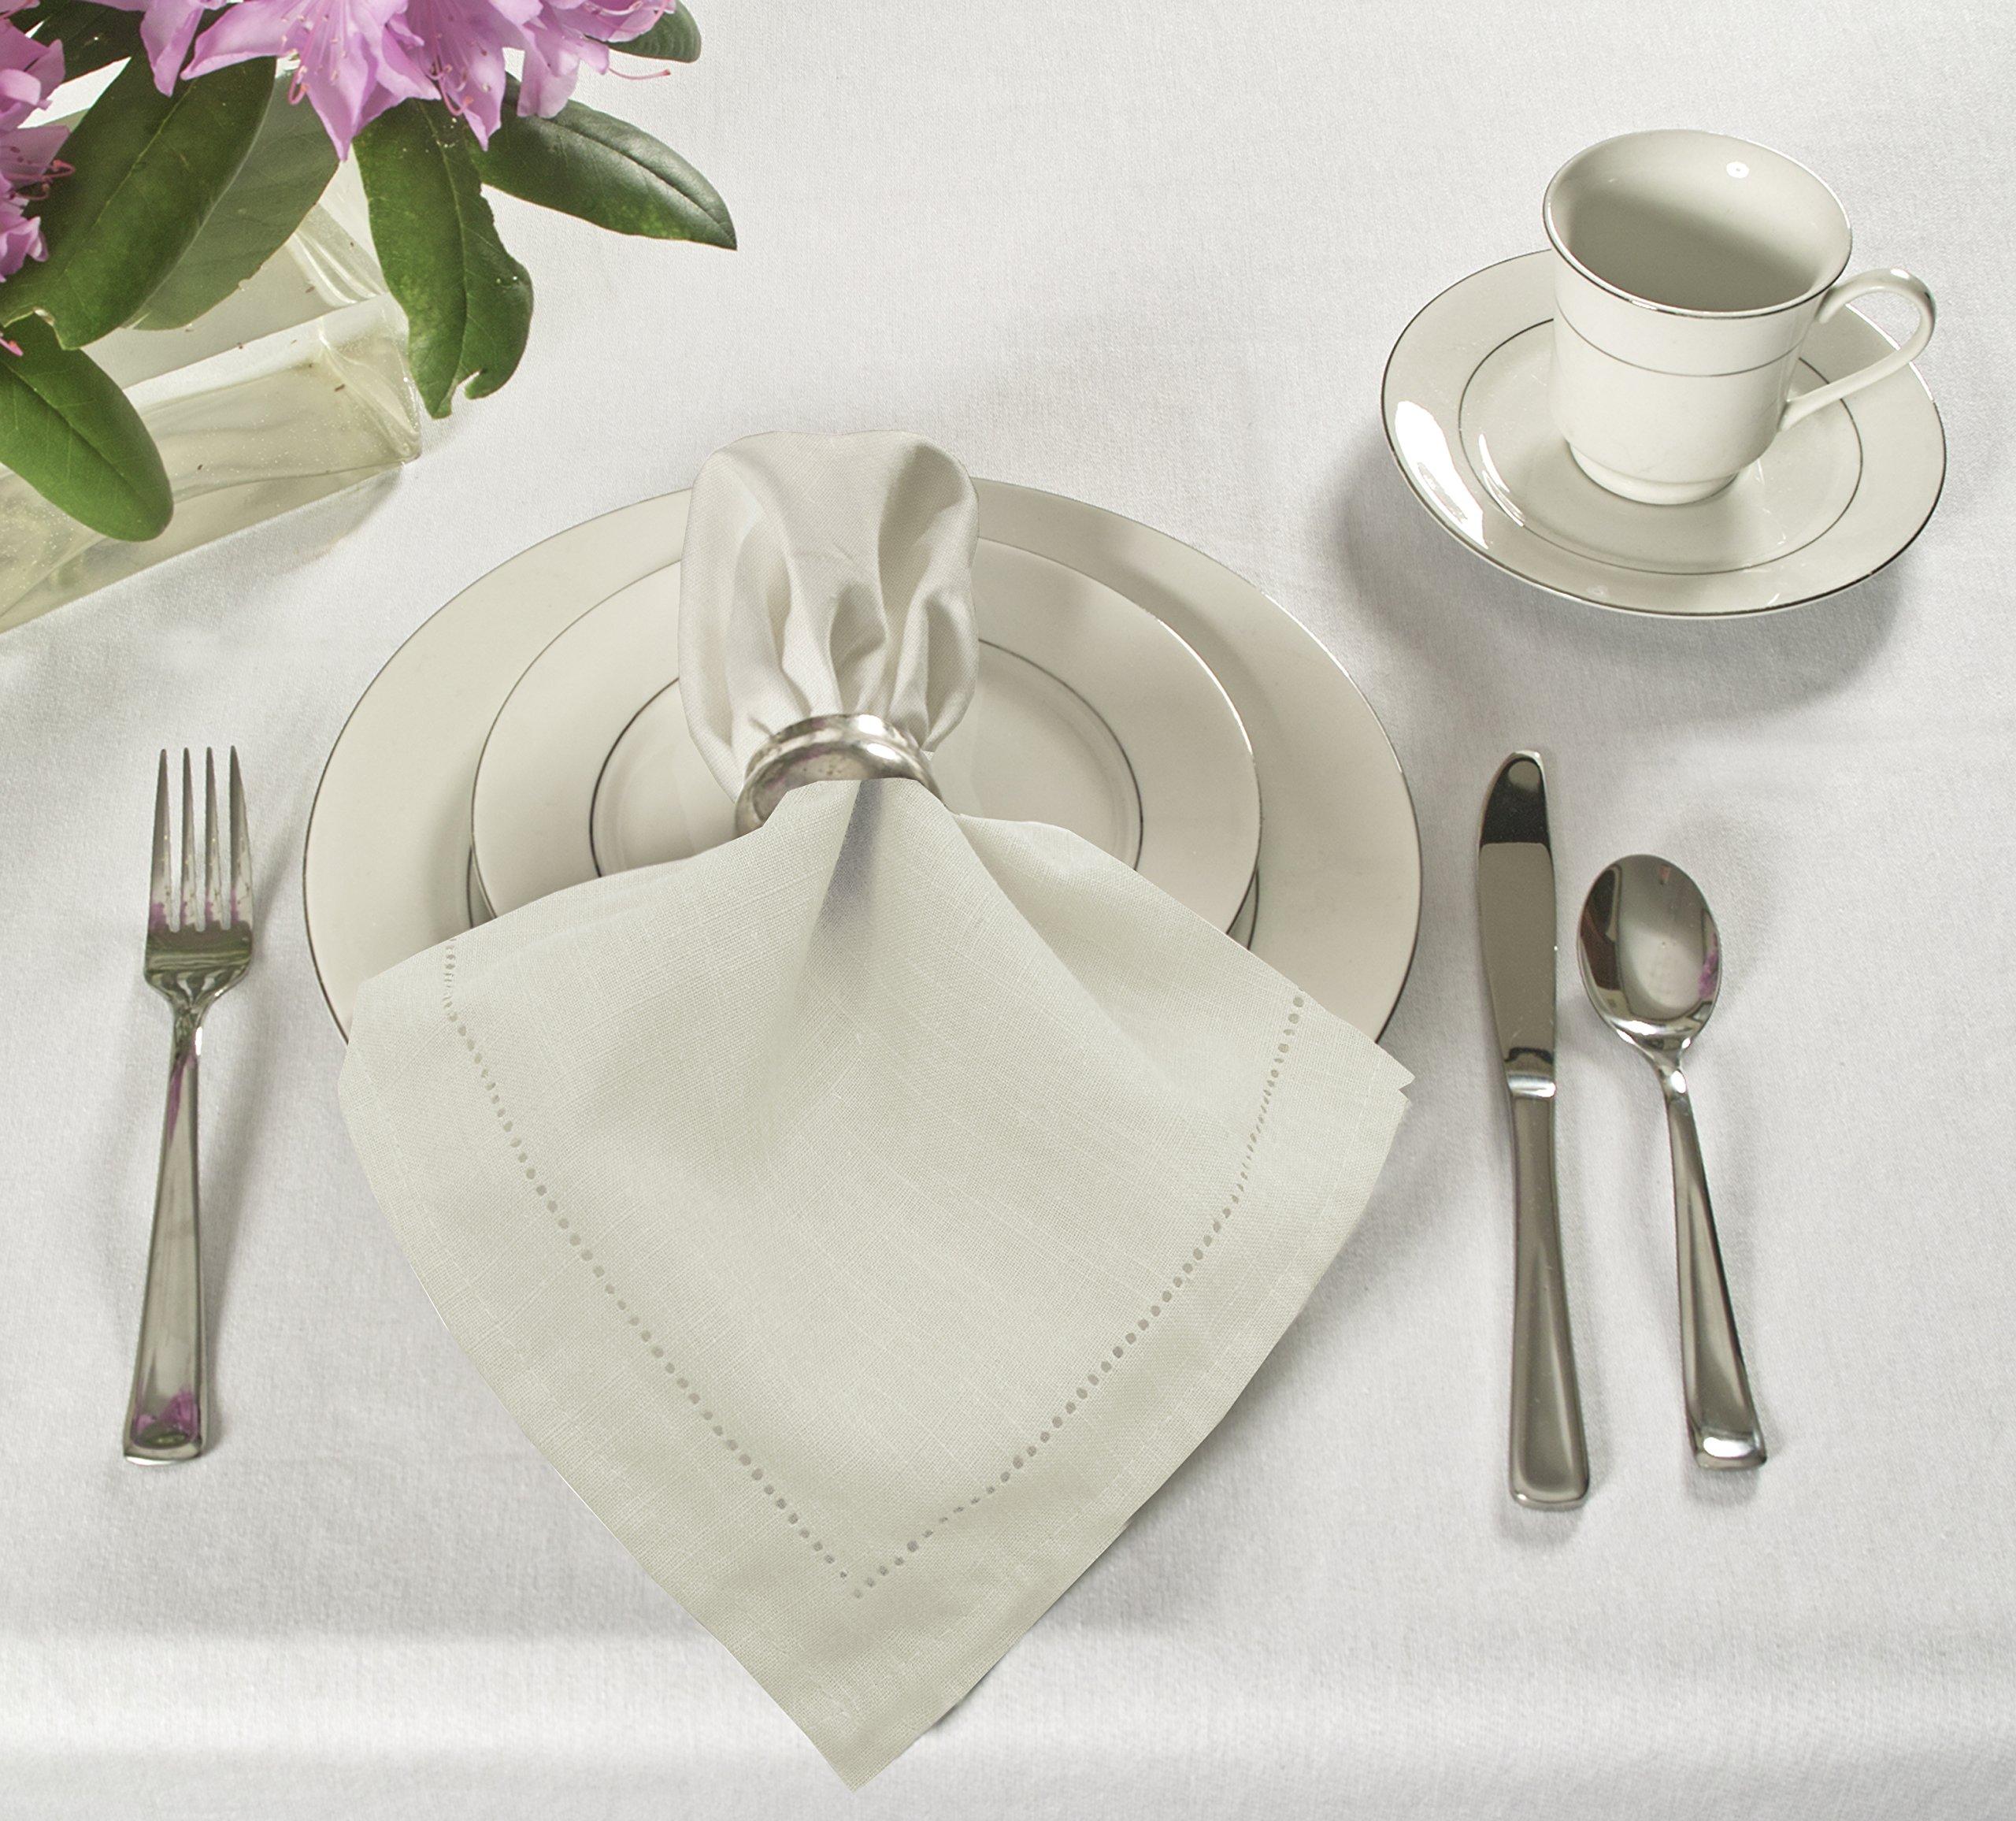 Elrene Home Fashions 026865885415 Solid Hemstitch Restaurant & Hotel Napkin, Set of 24, 18'' x 18'', Ivory